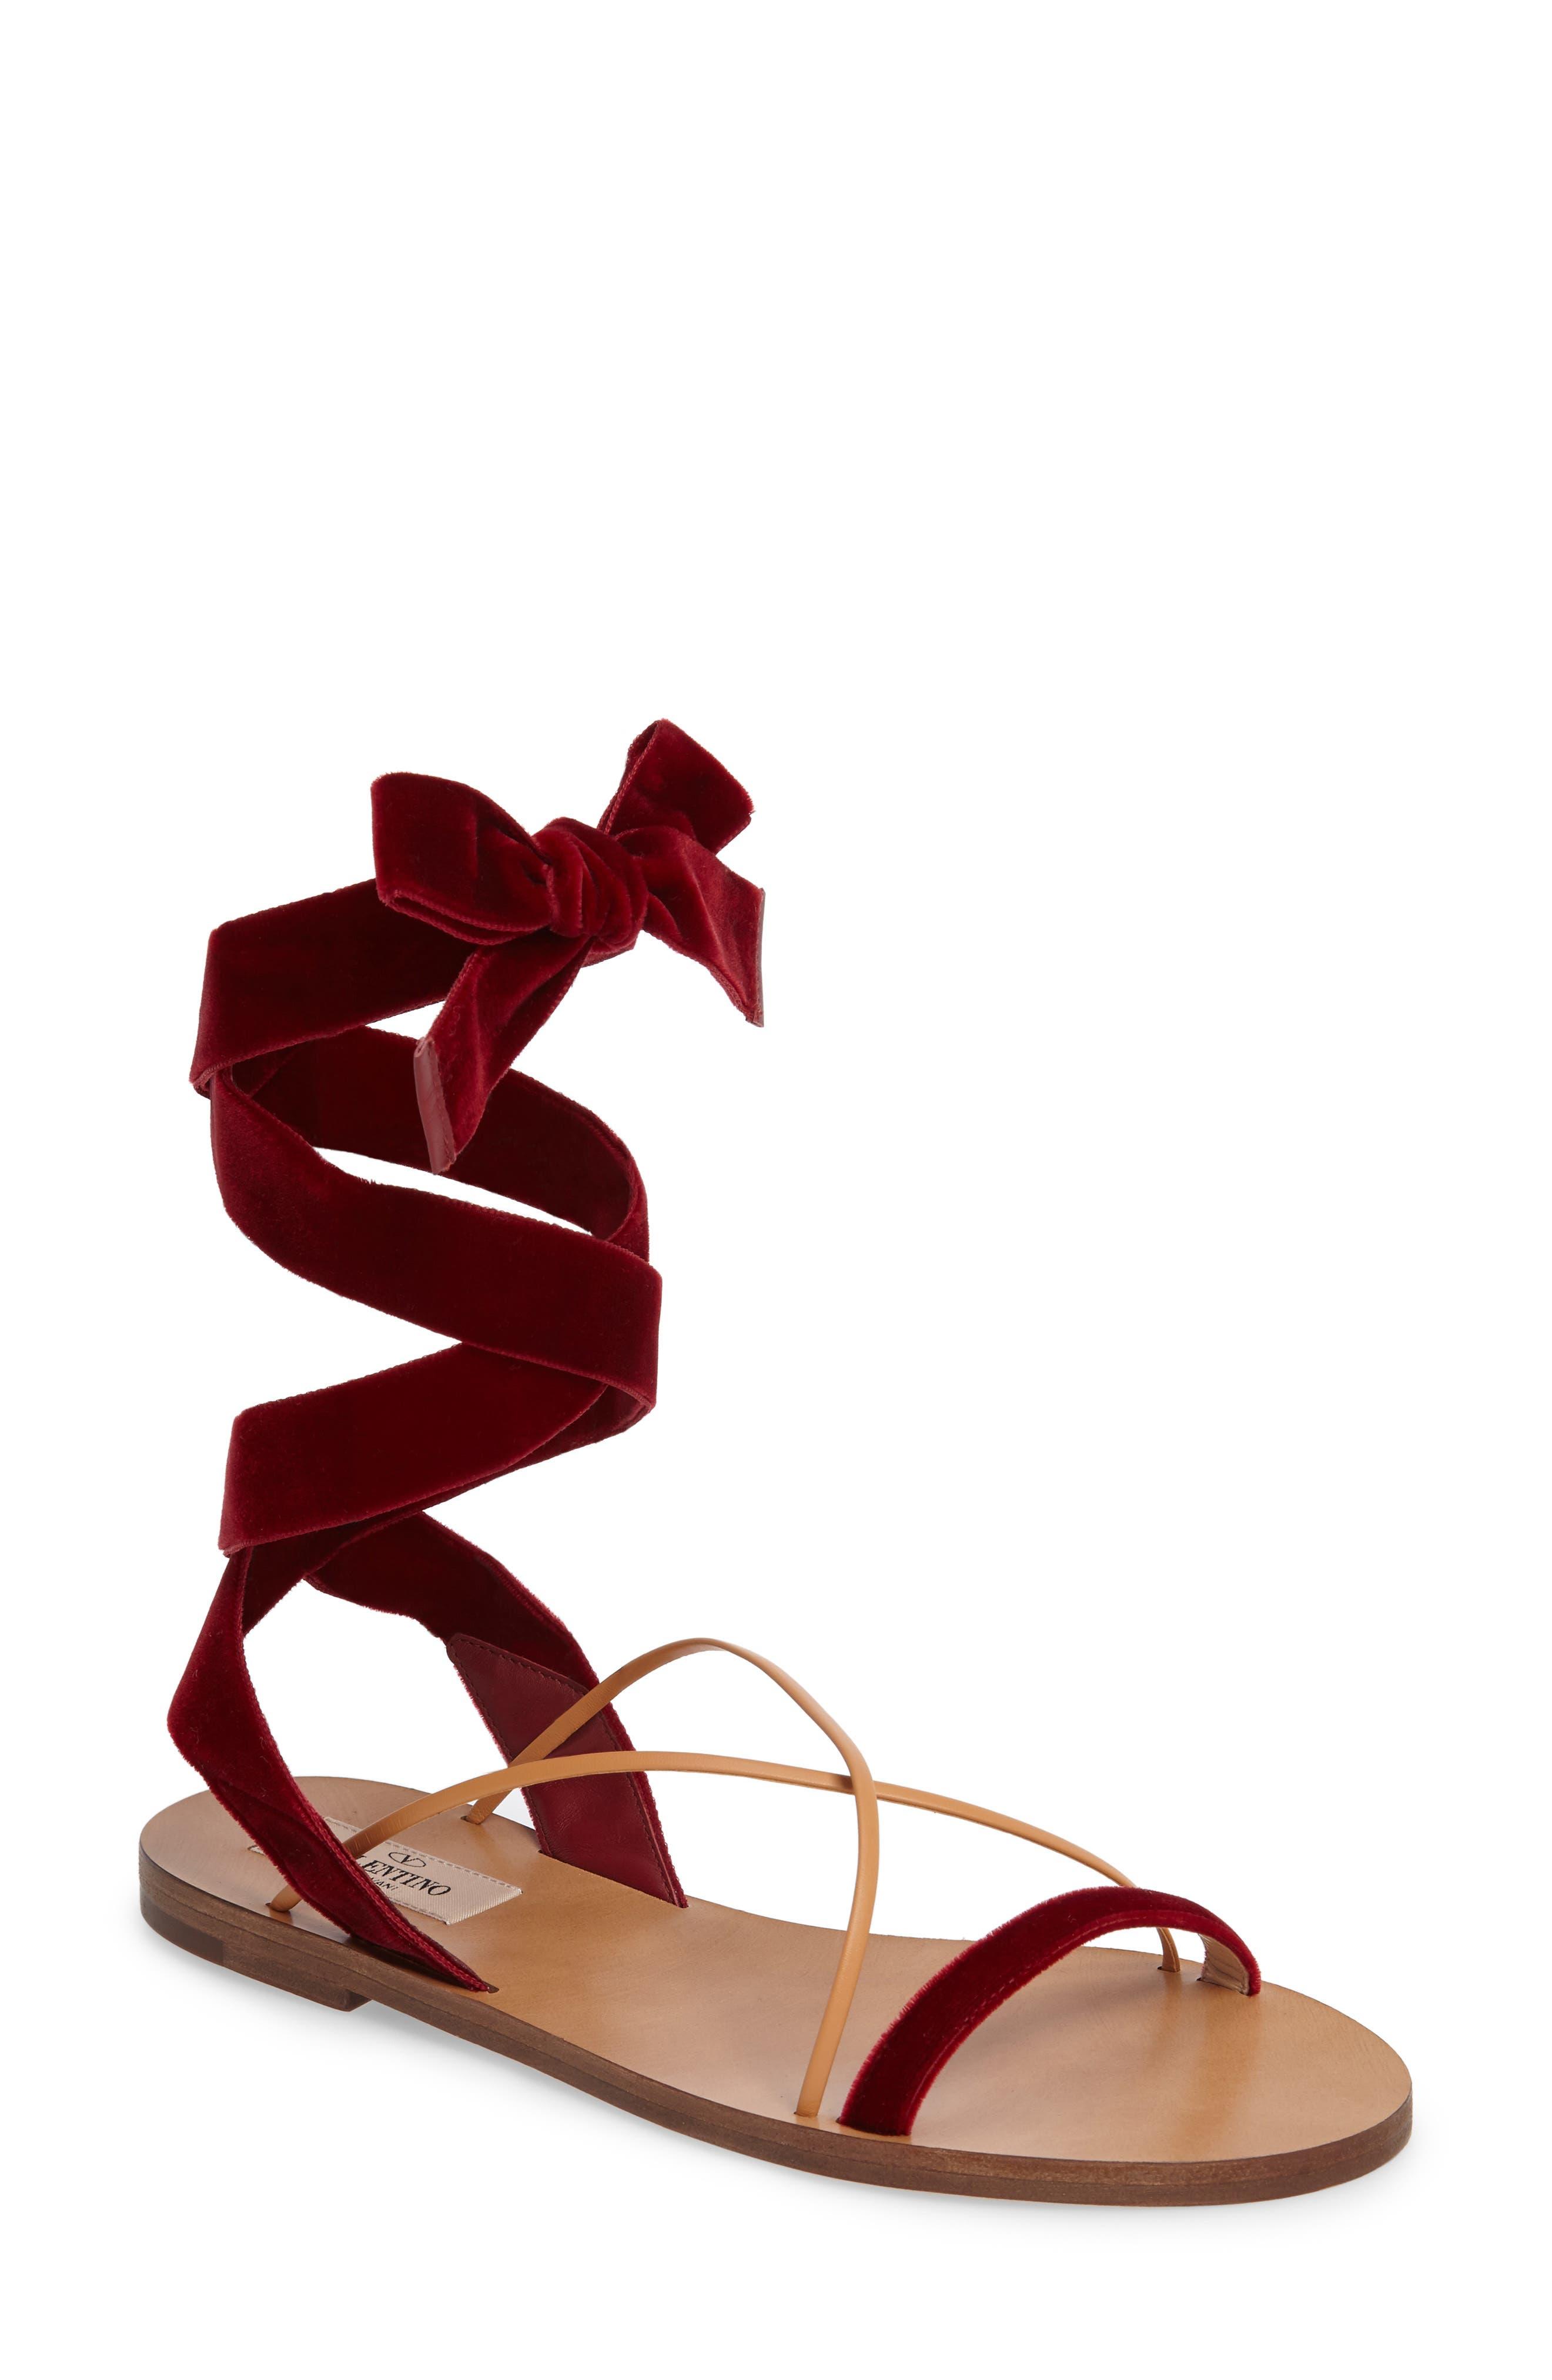 Main Image - Valentino Lace-up Sandal (Women)